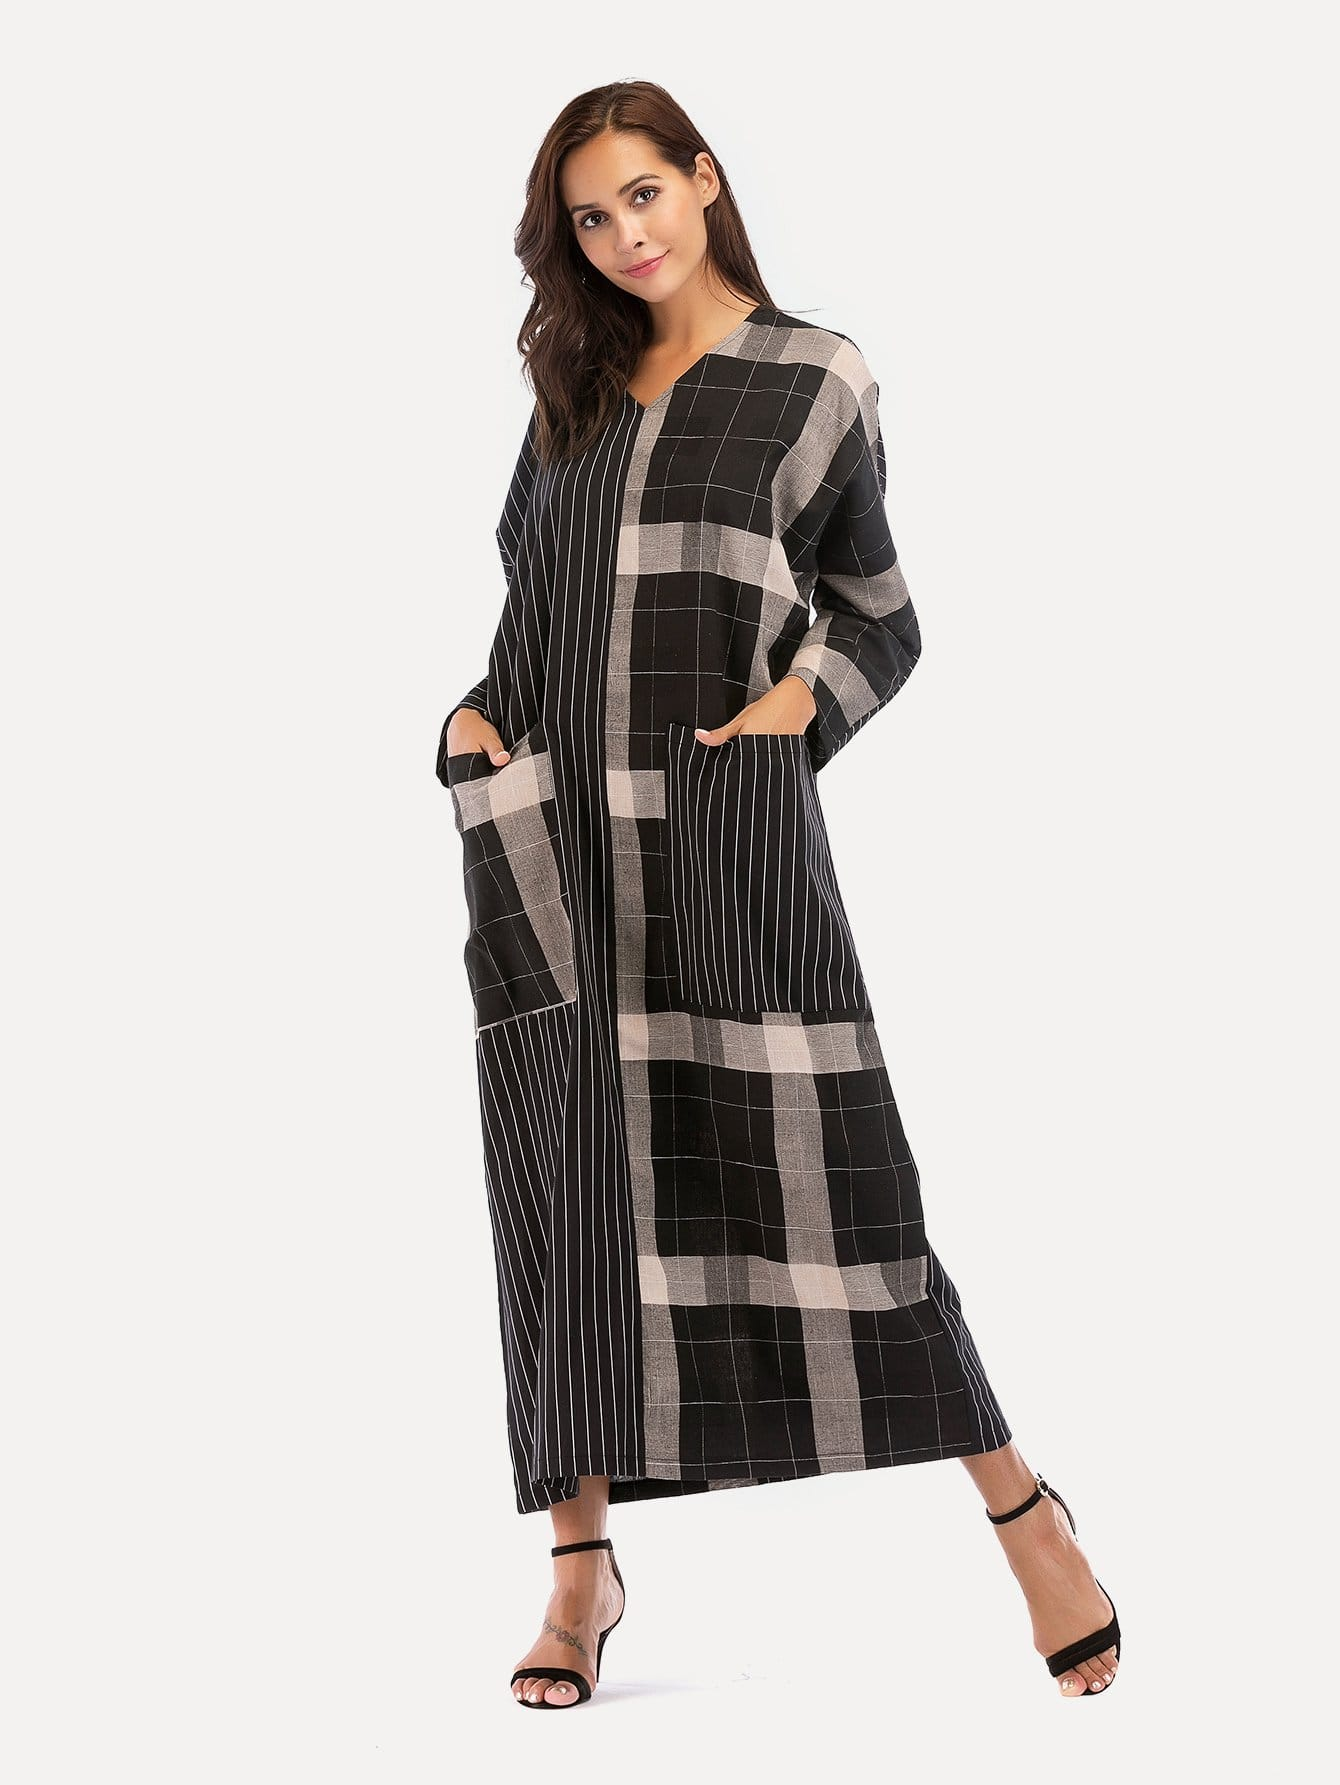 Dual Pocket Stripe Contrast Plaid Longline Dress contrast plaid tee